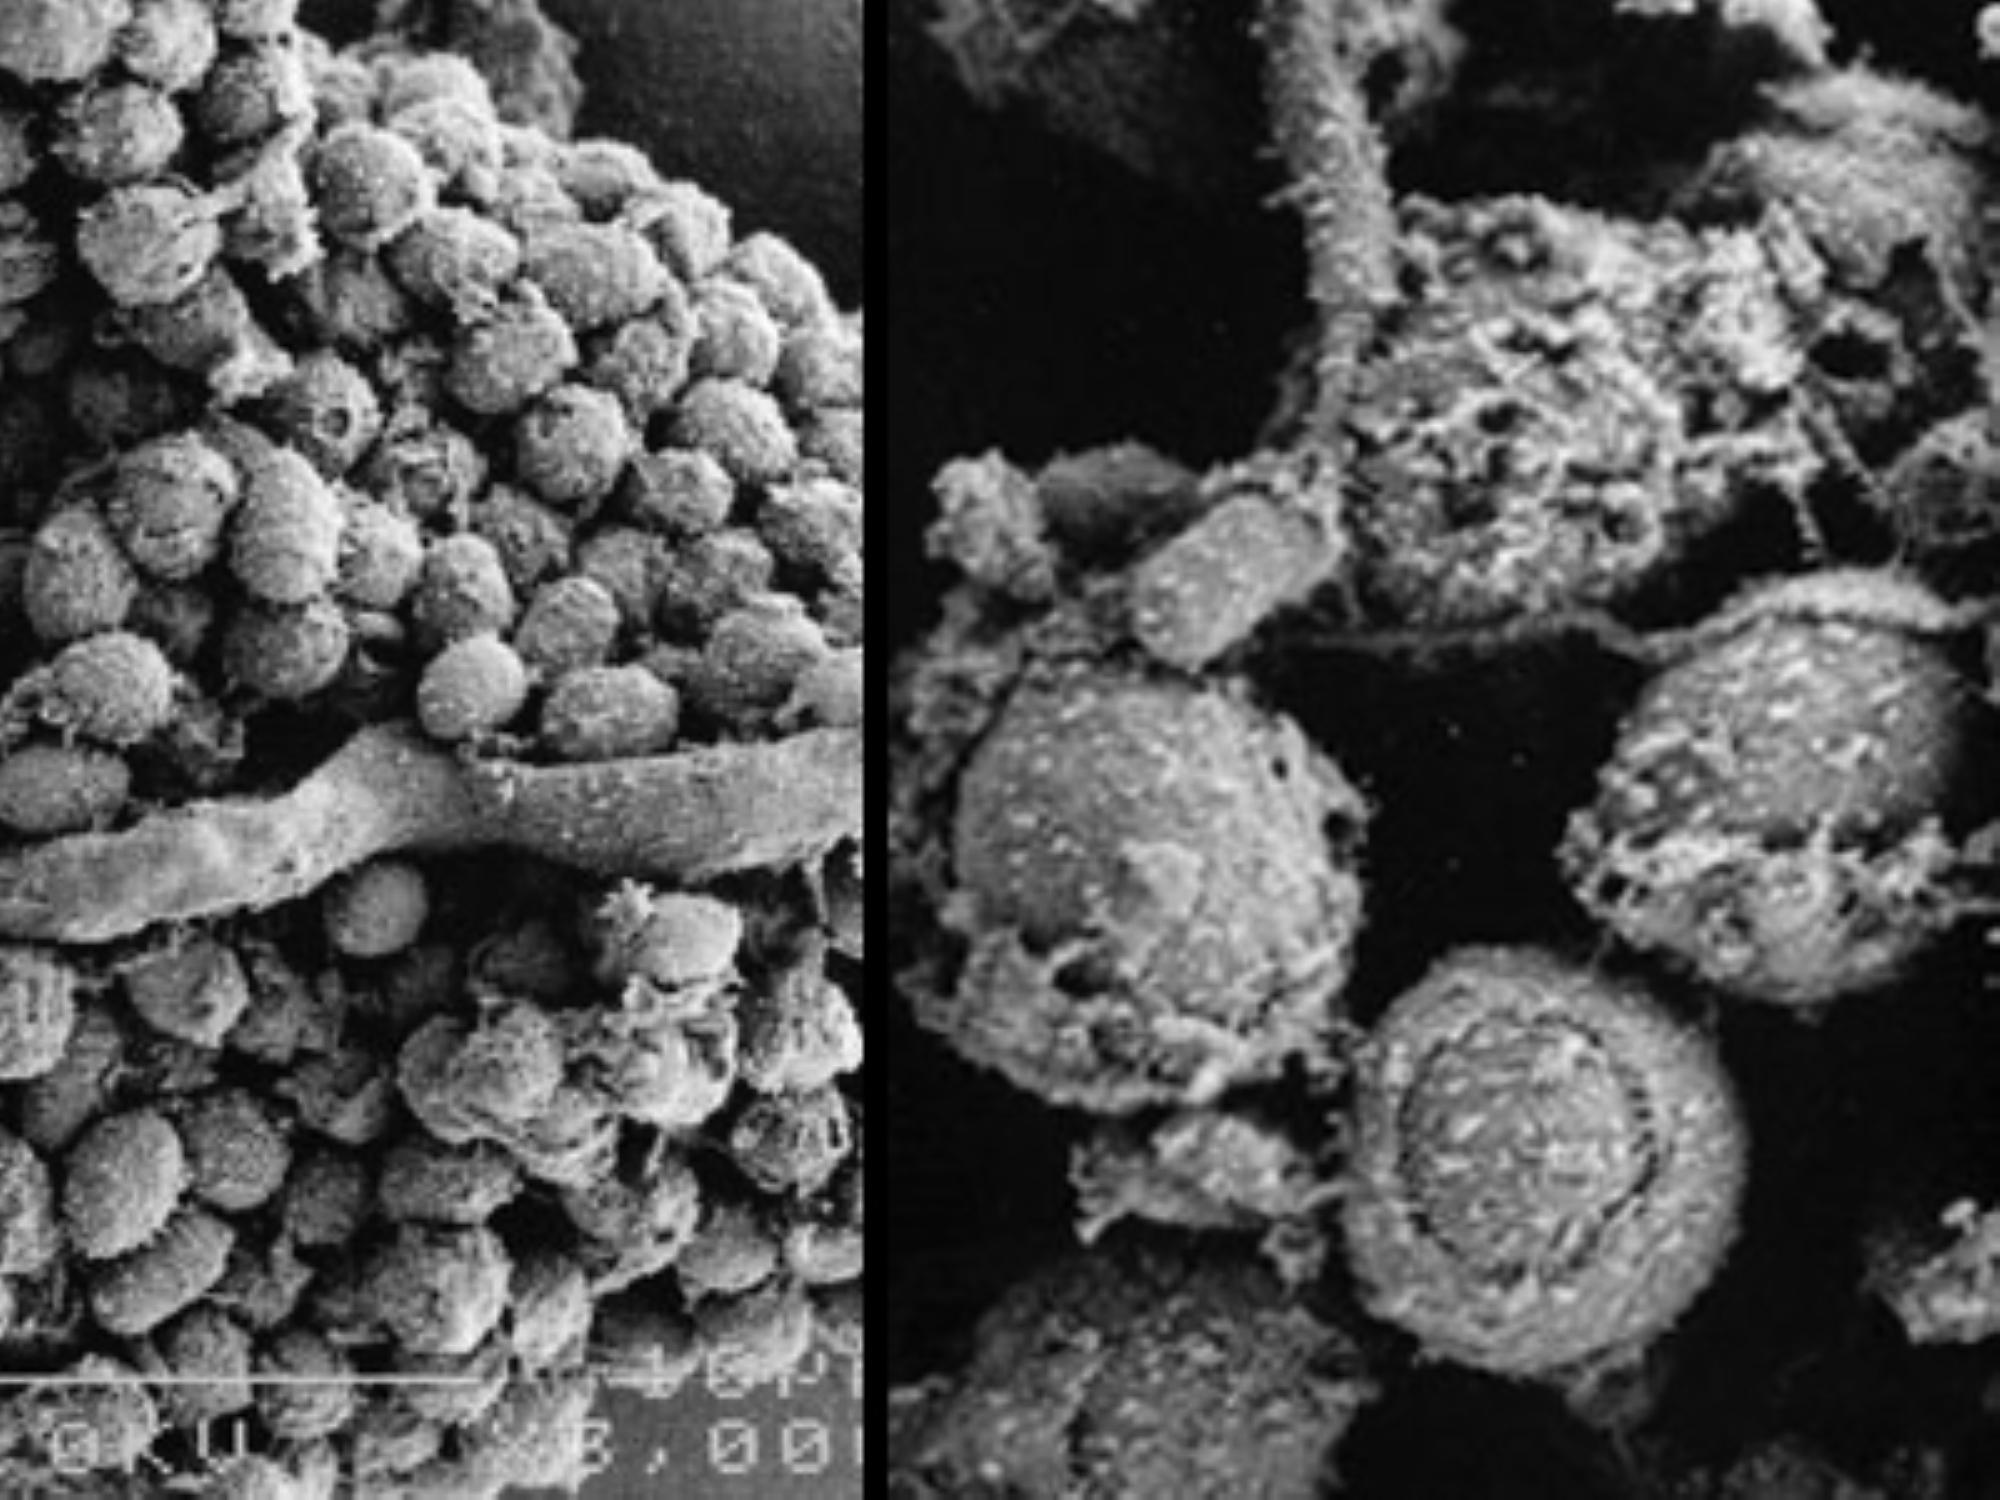 mold-fungus-image